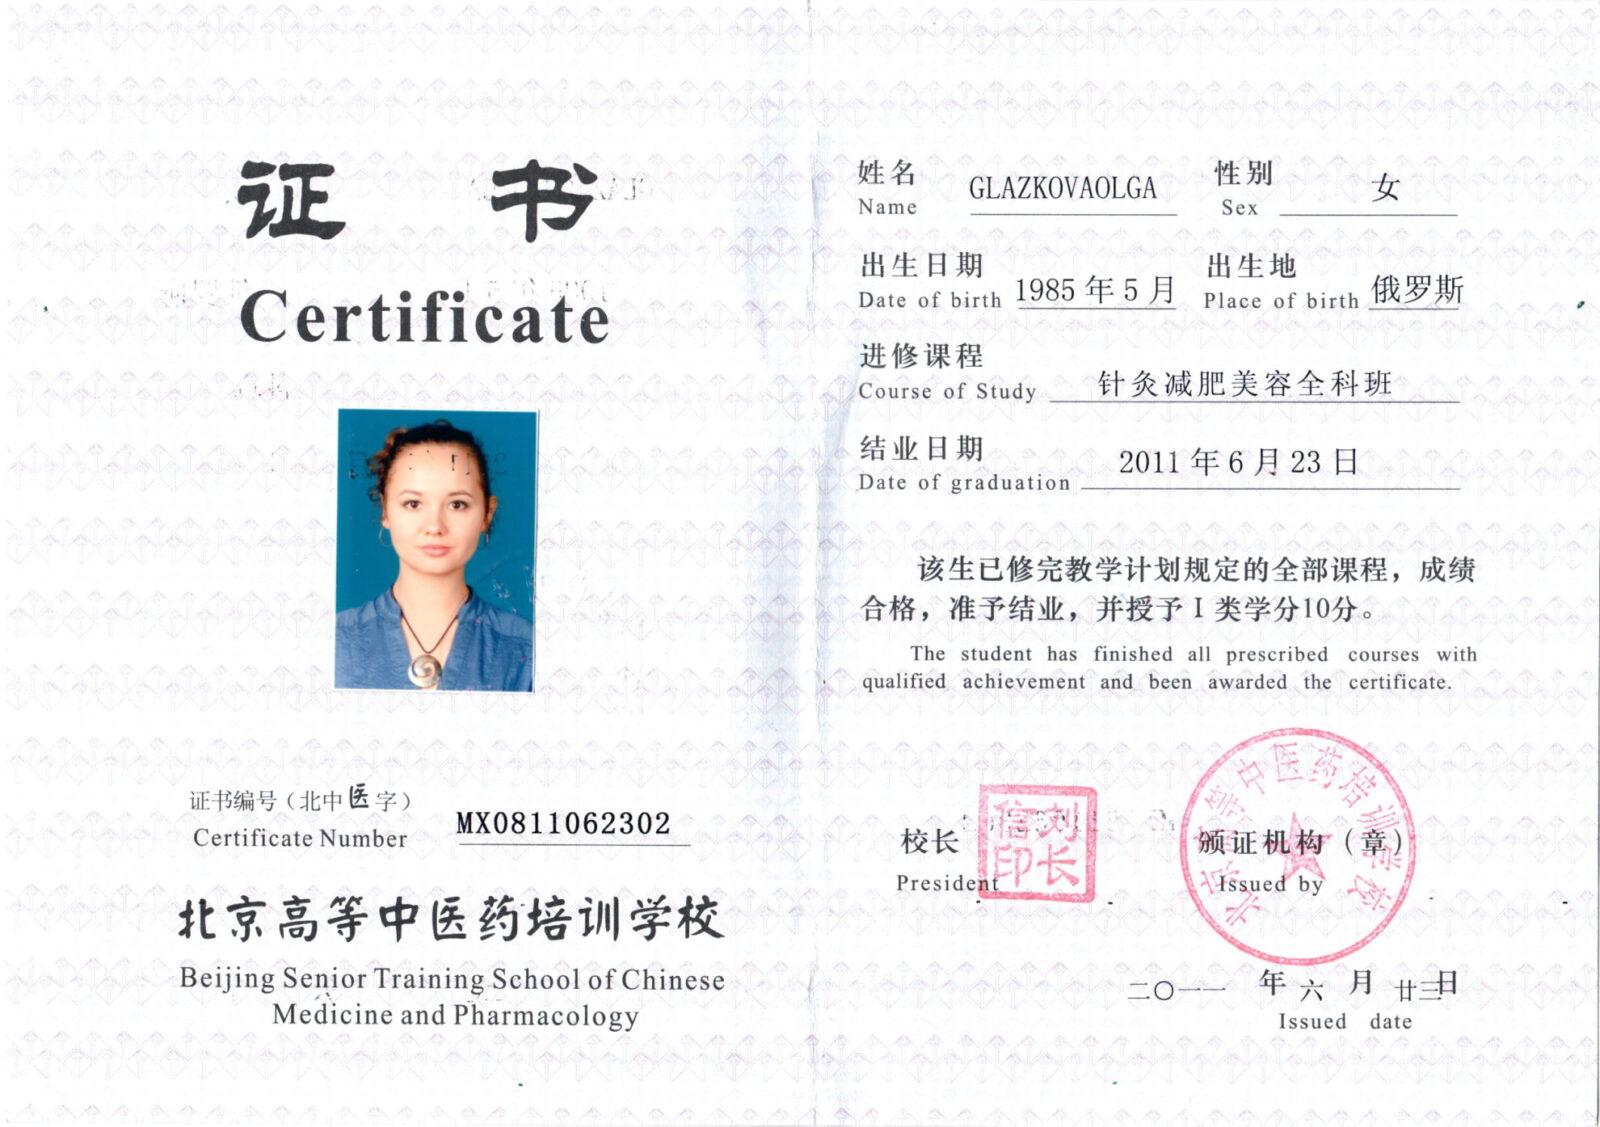 2011.06.23 Сертификат